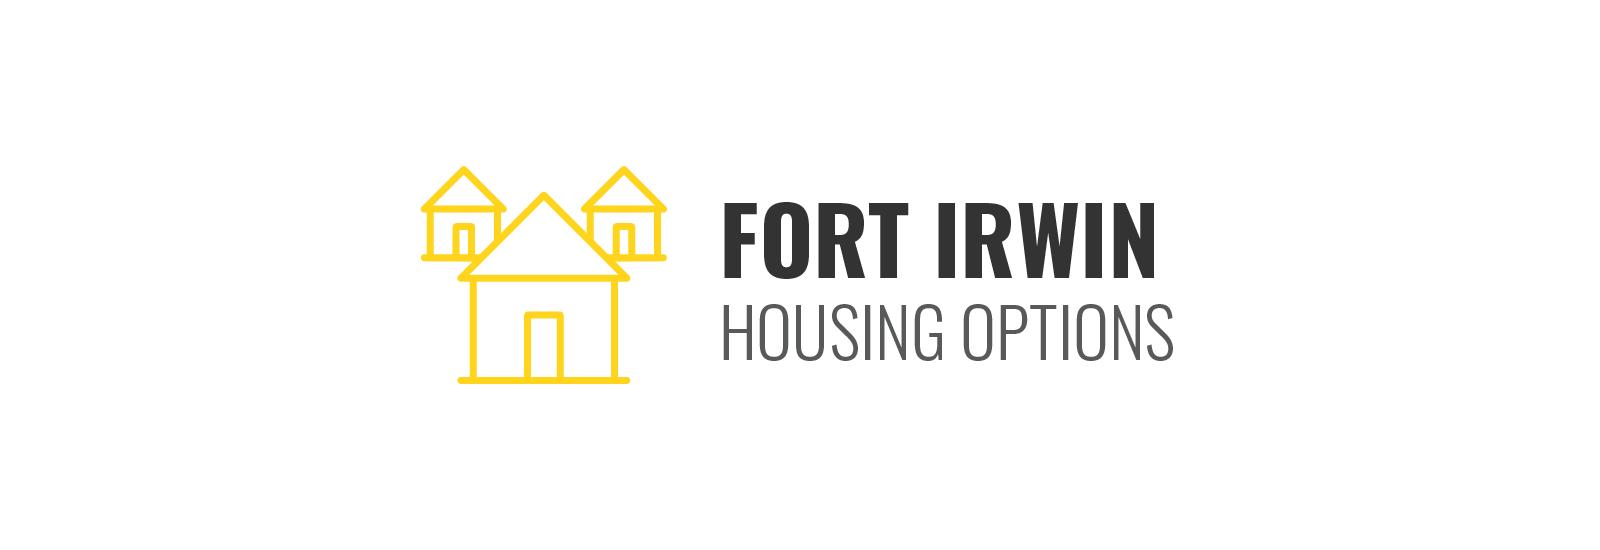 Fort Irwin Housing Options